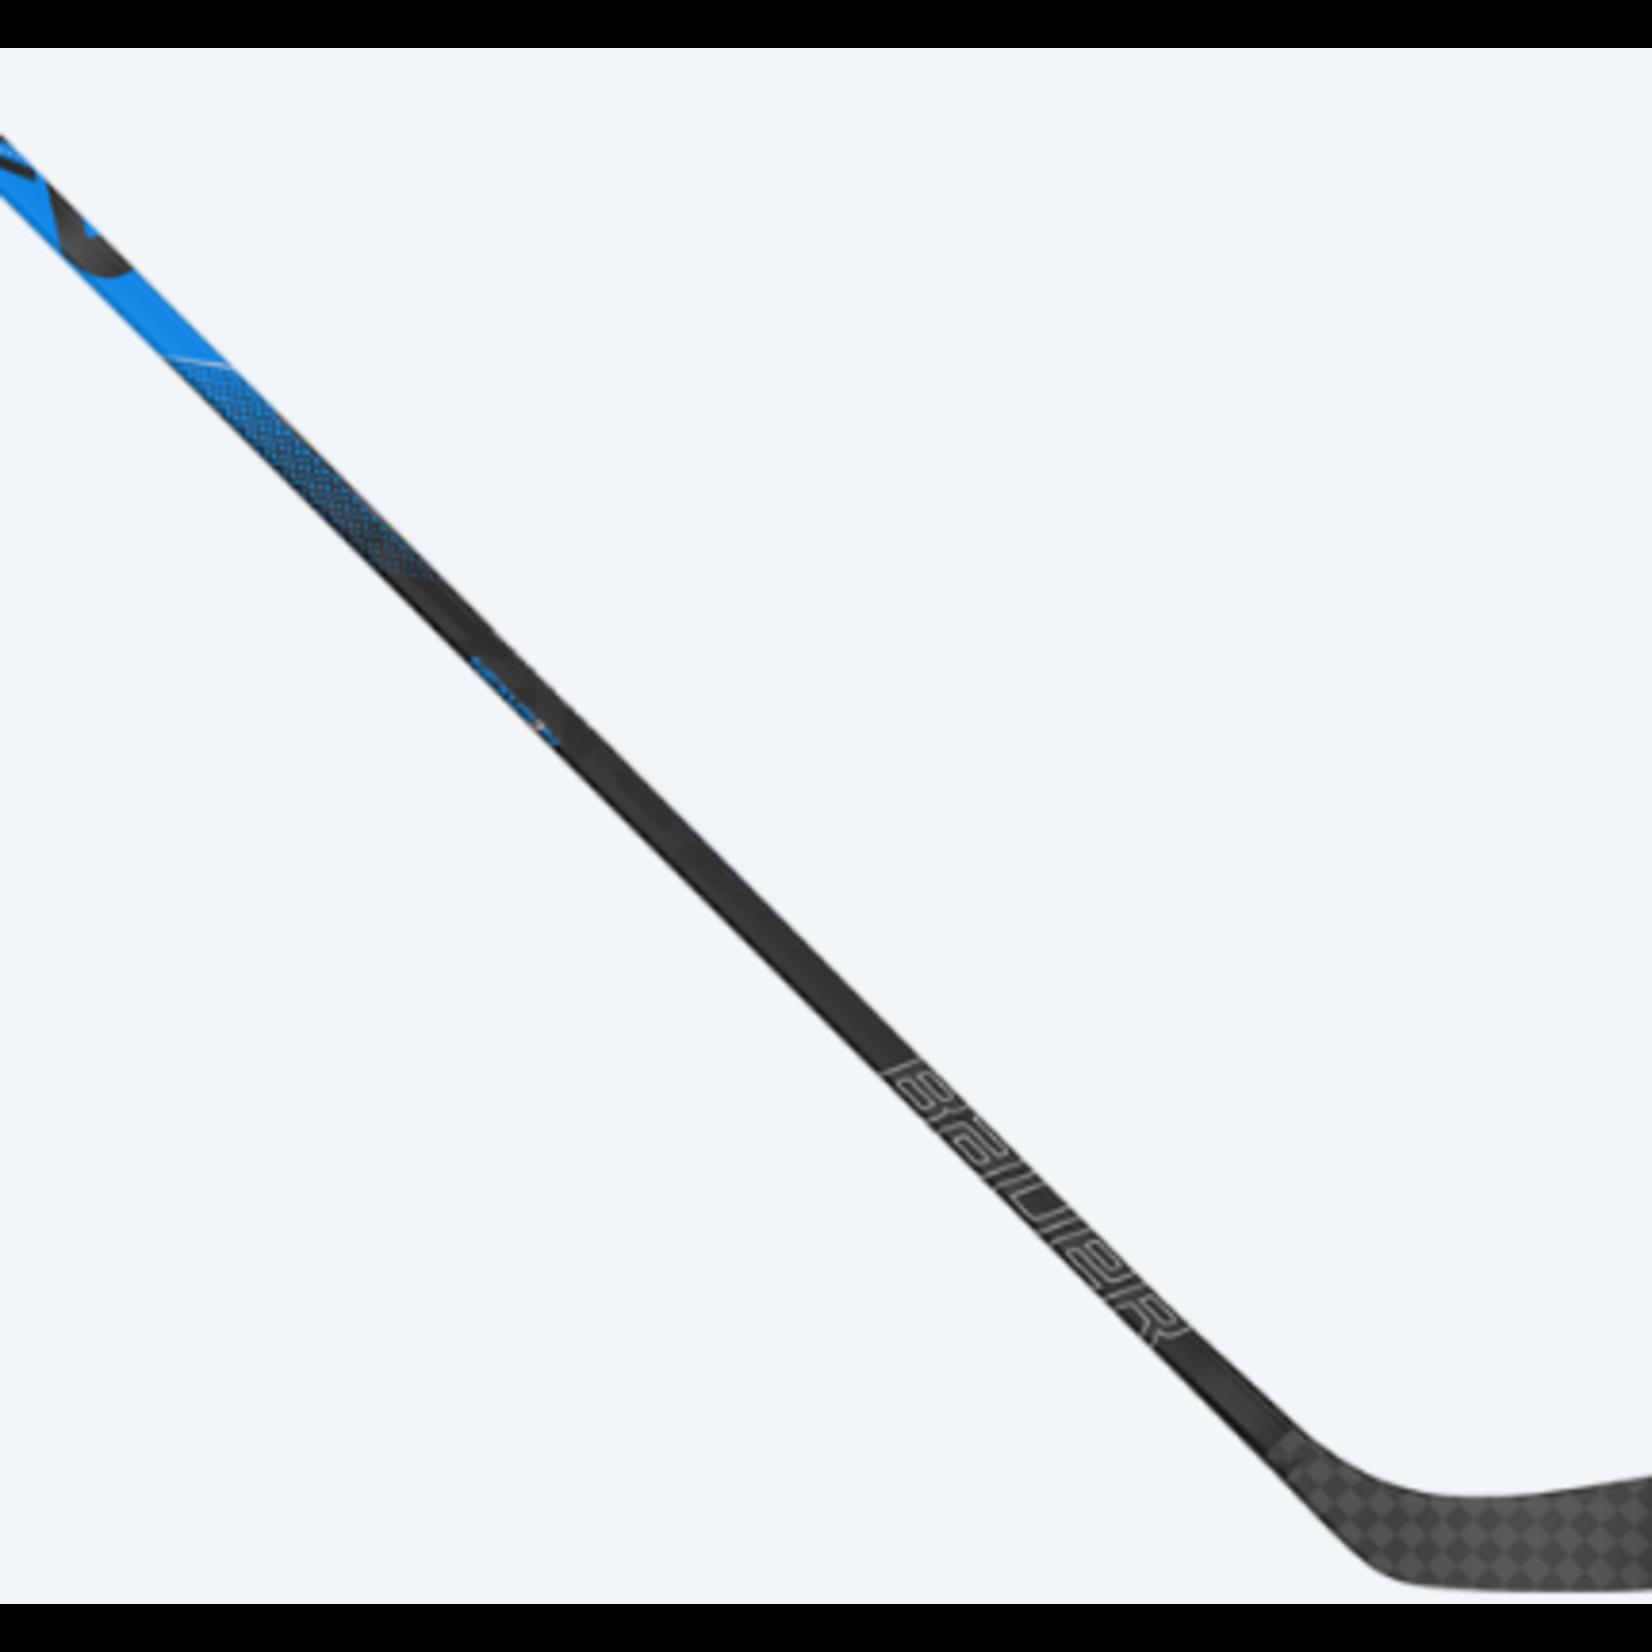 S21 Nexus 3N Grip Stick Jr - 50